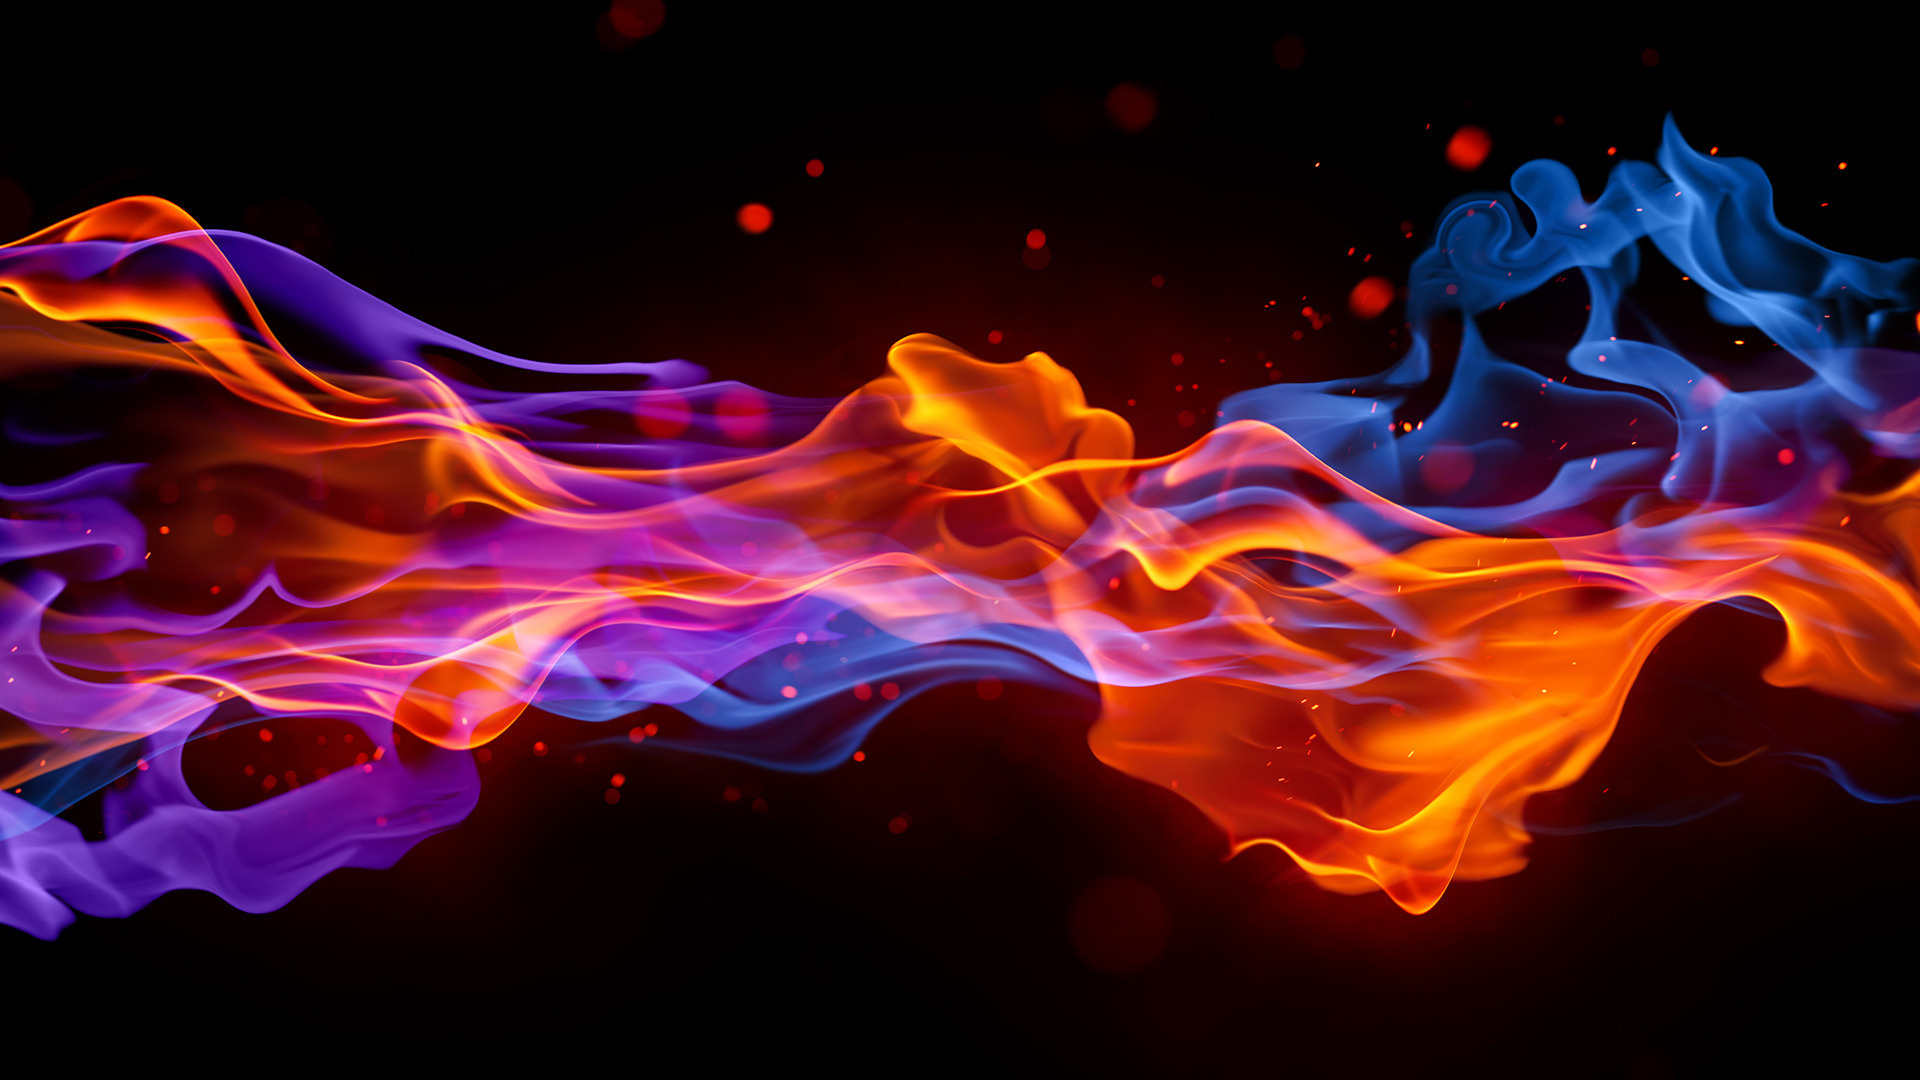 Fire Wallpapers For Desktop: Technorockks: 47 Stunning Fire Wallpaper